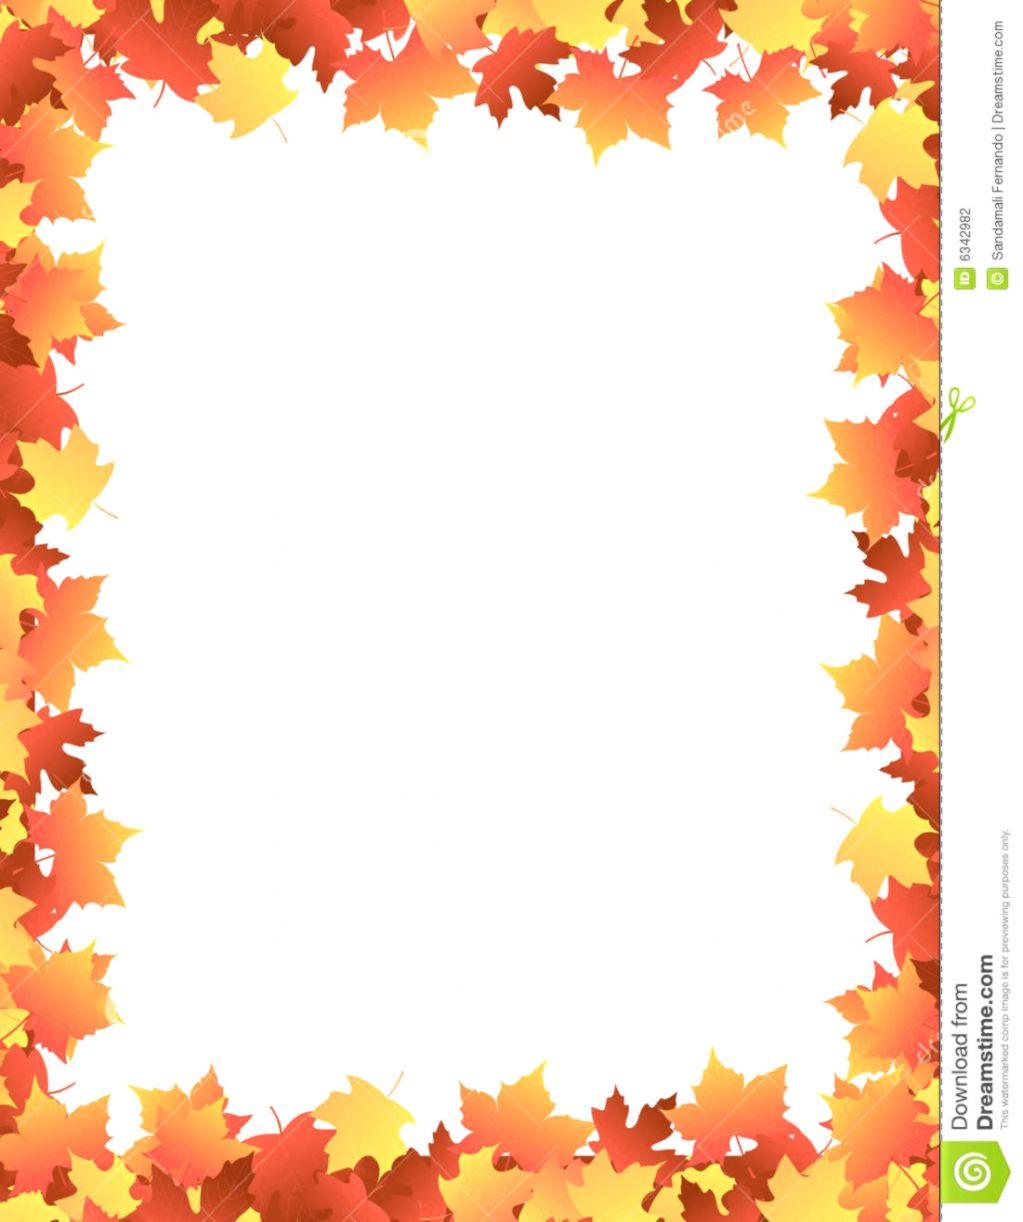 Autumn leaves borders clipart clip art Autumn Leaves Border Clipart | Wallpapers Turret clip art